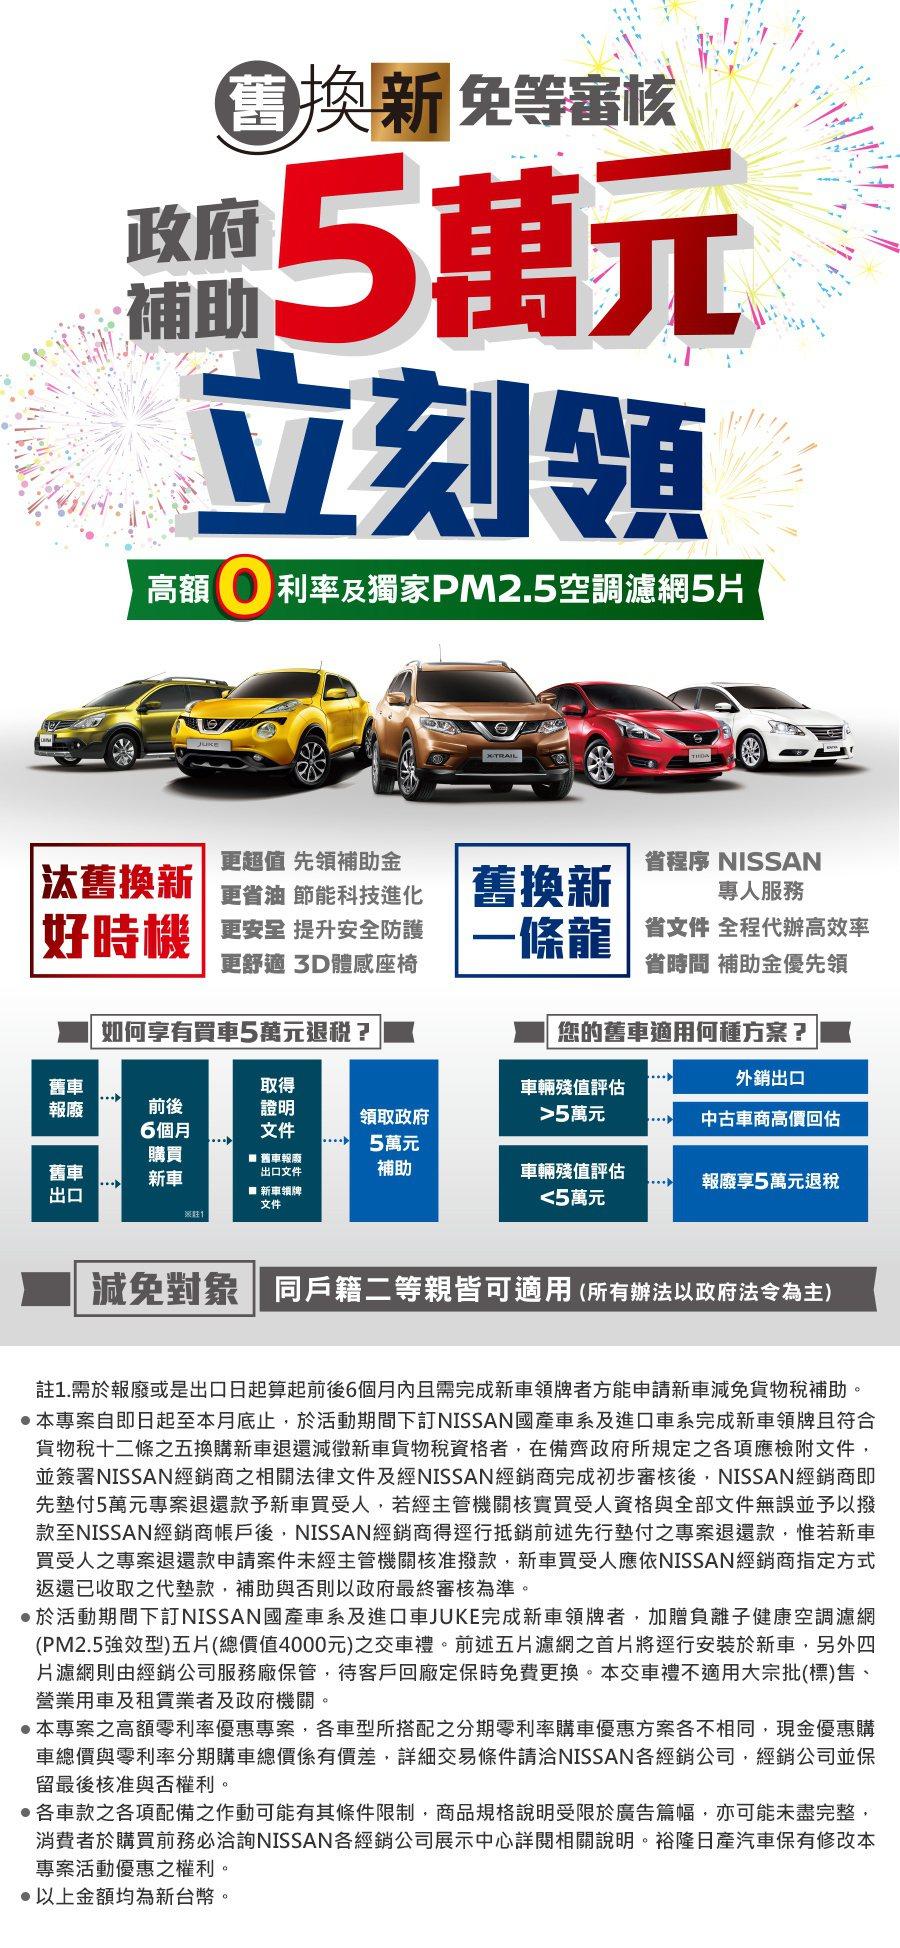 Nissan推出政府補助五萬元立刻領活動。圖/裕隆日產提供